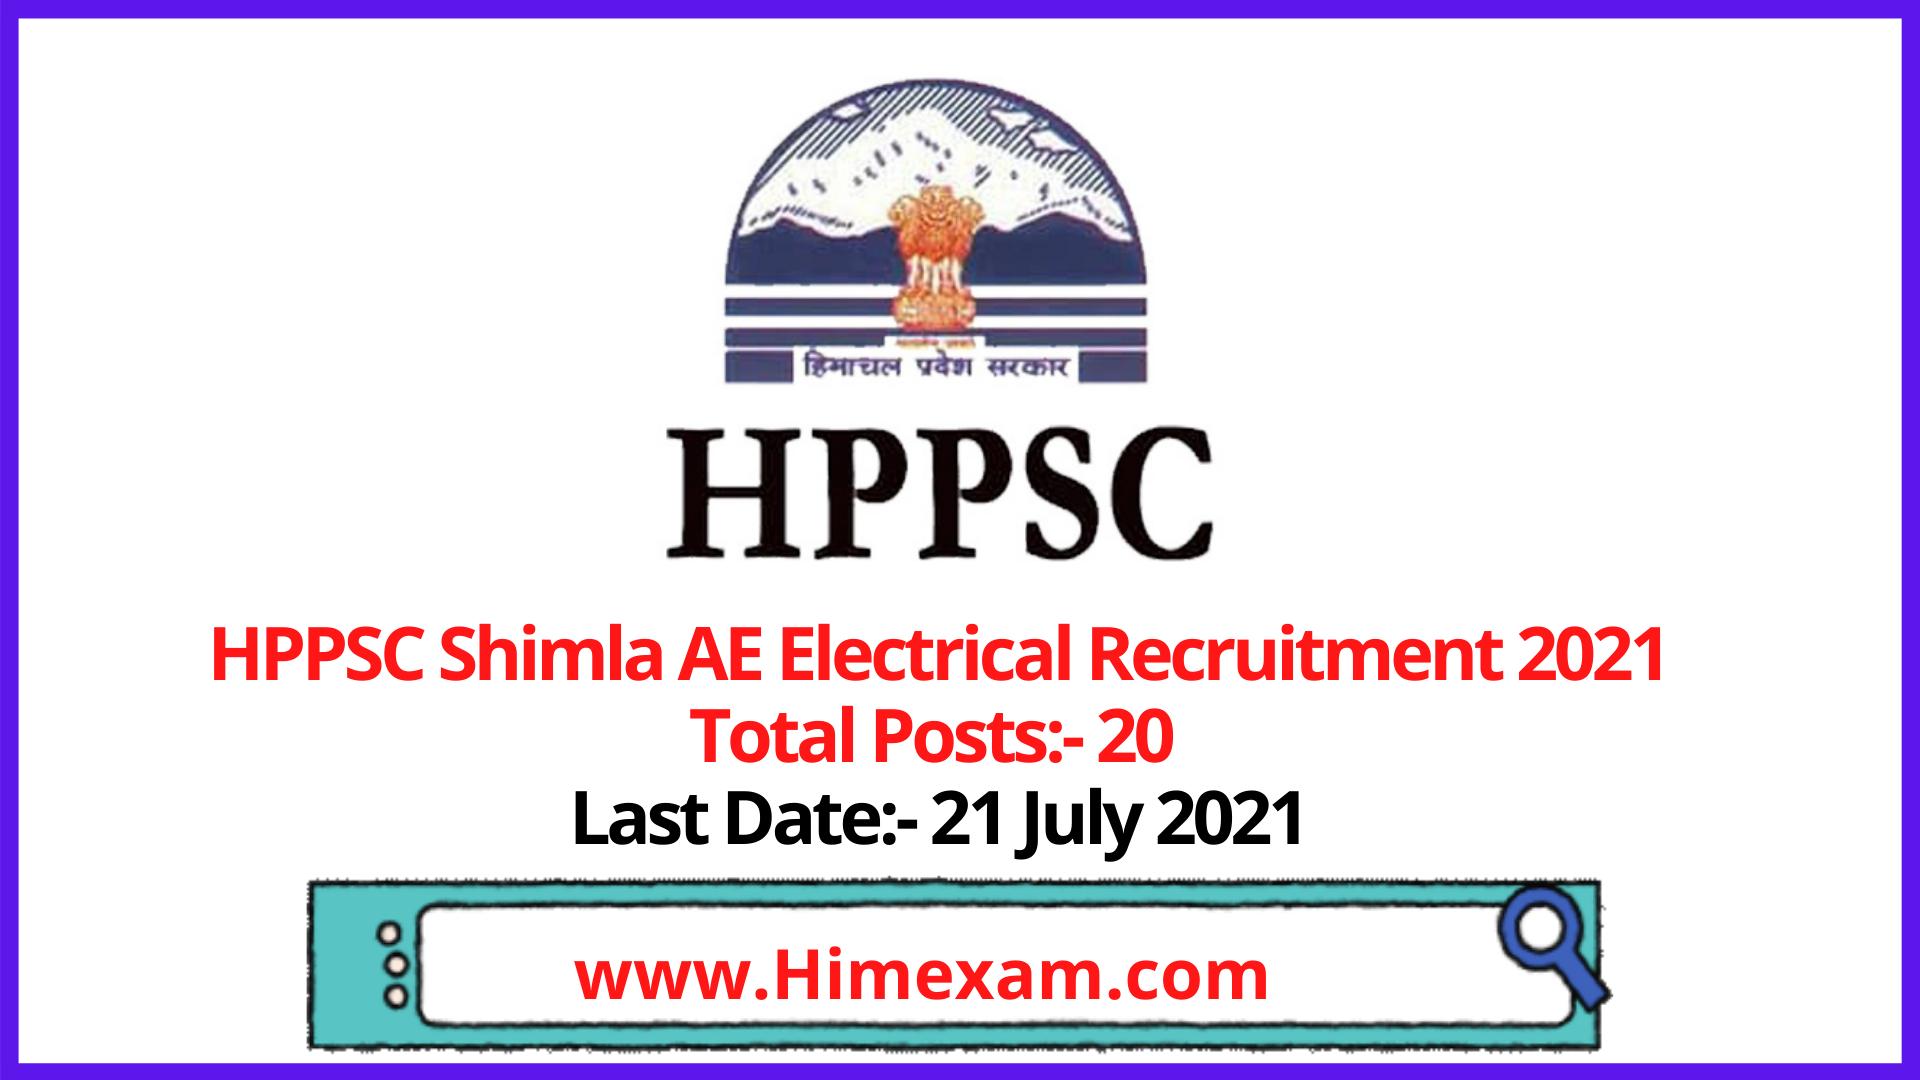 HPPSC Shimla AE Electrical Recruitment 2021